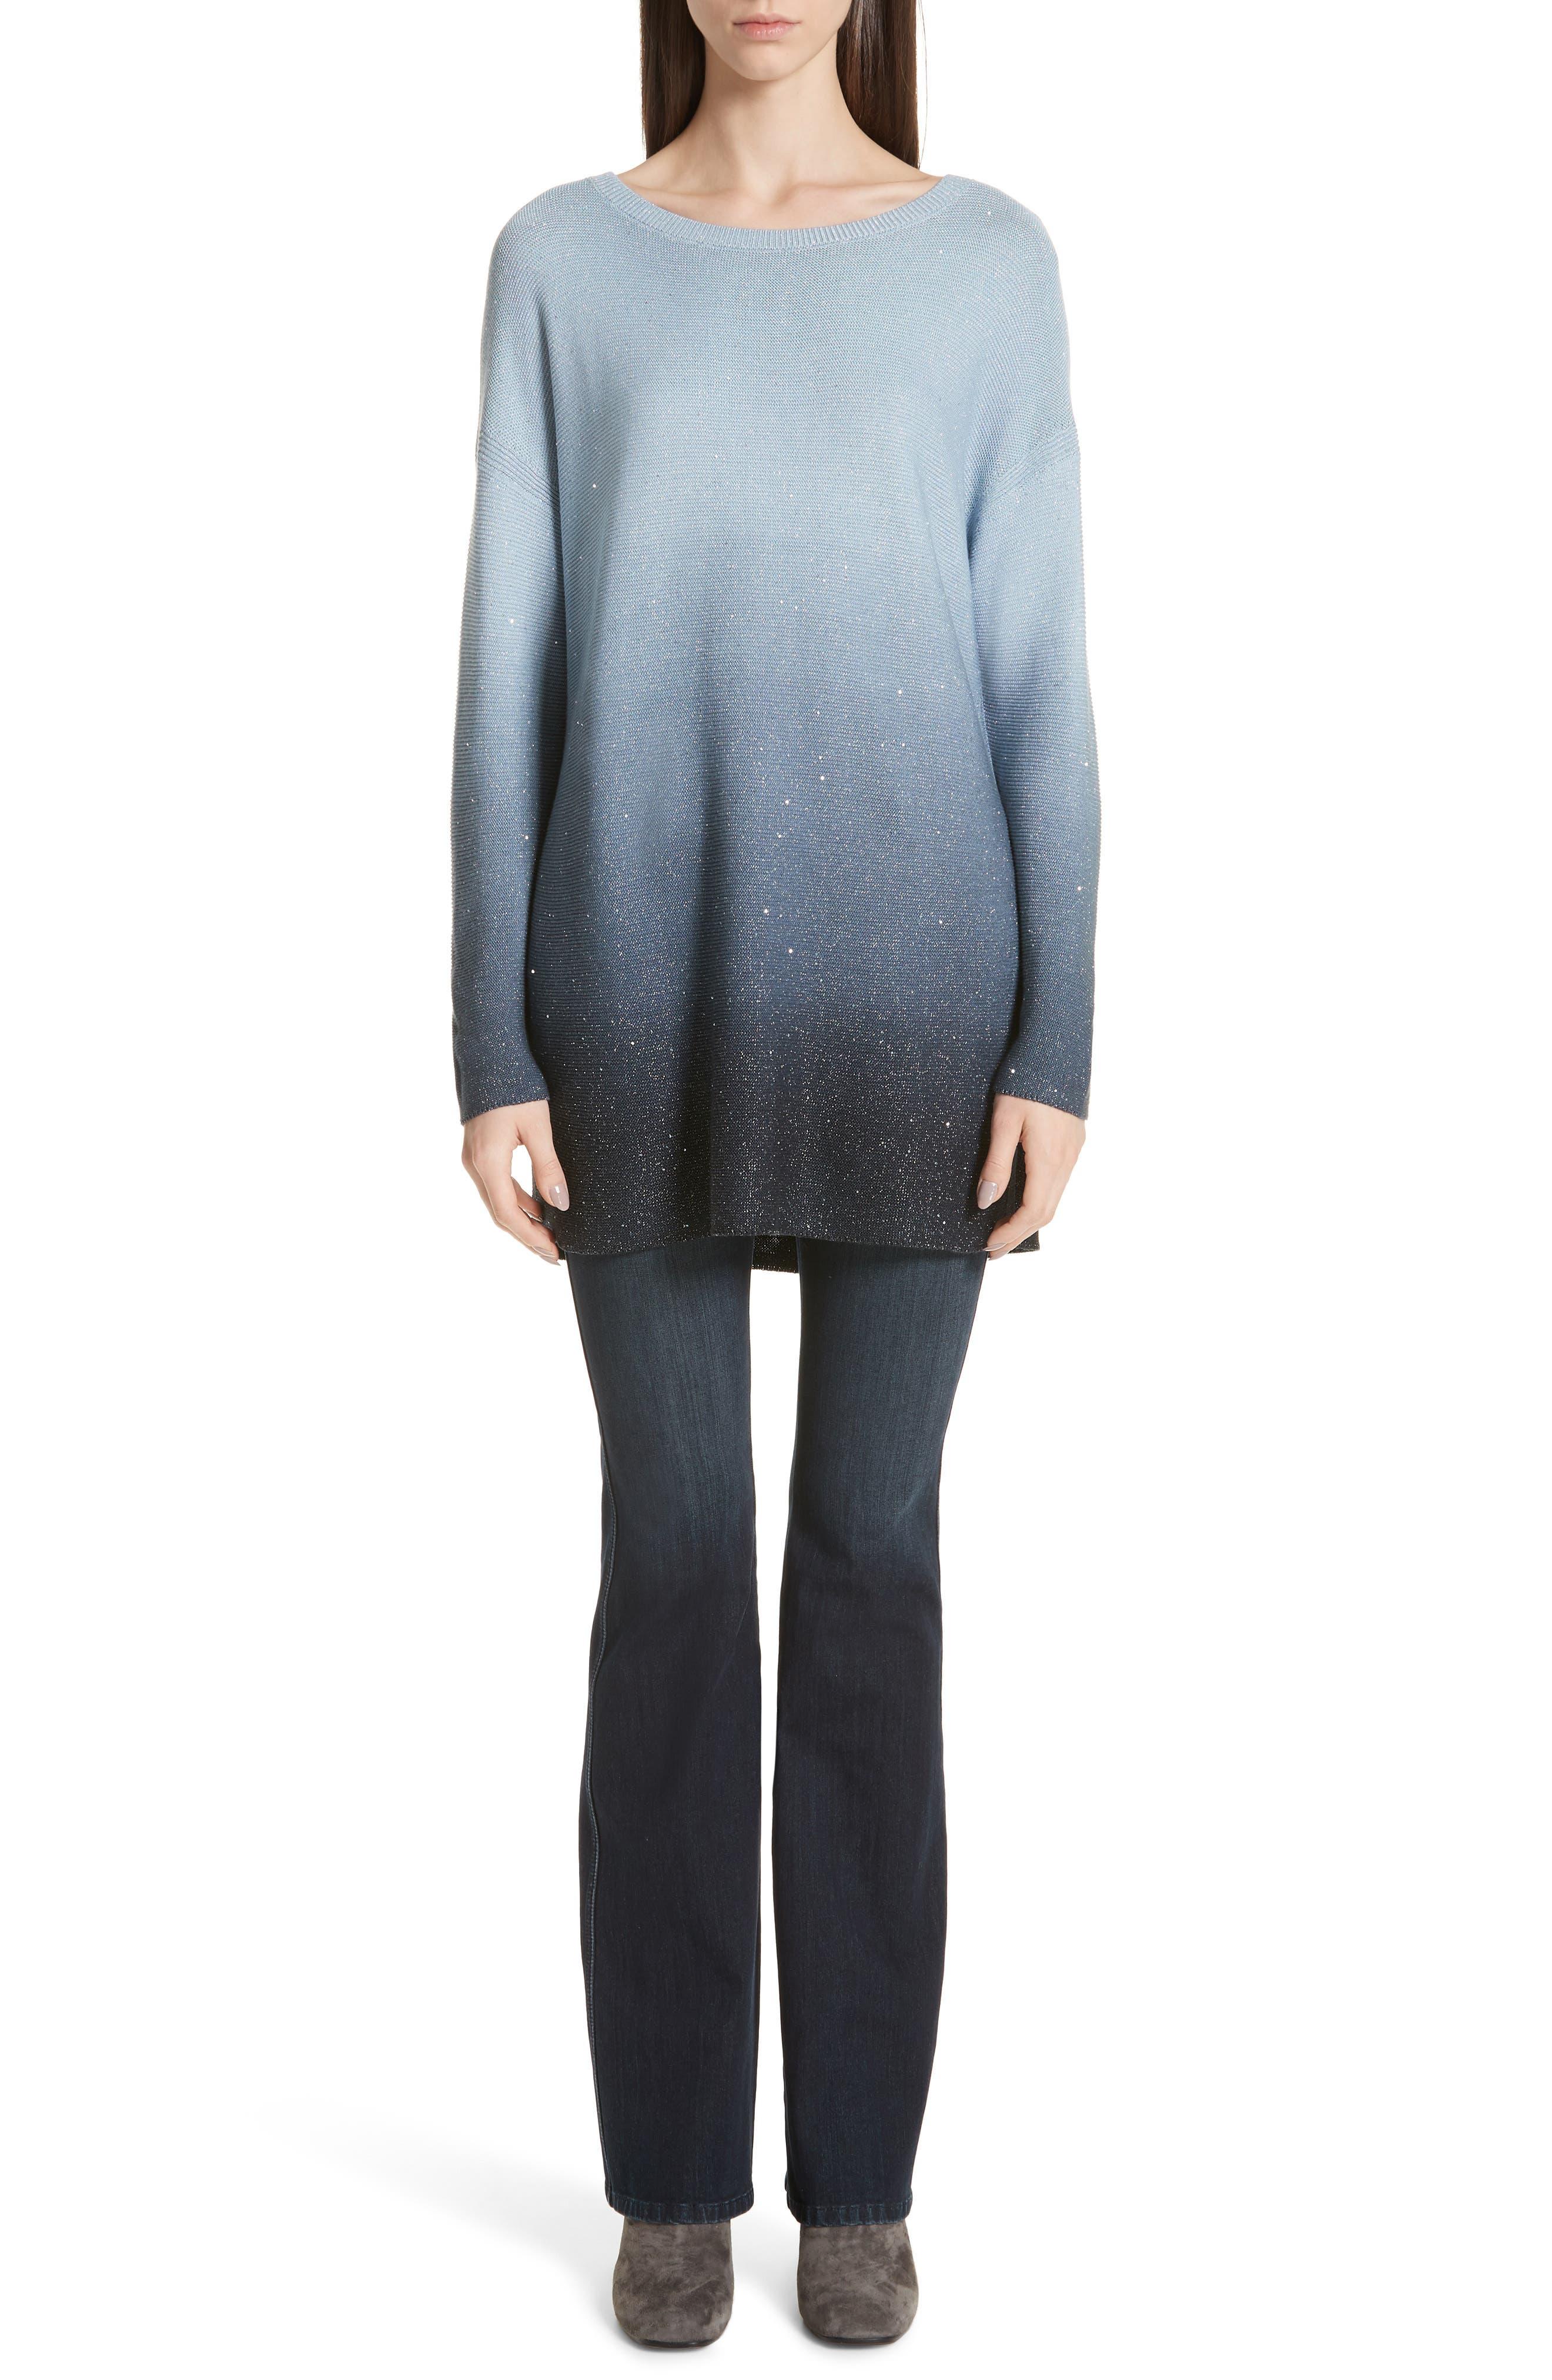 LAFAYETTE 148 NEW YORK, Sequin Ombré Silk Blend Tunic, Alternate thumbnail 7, color, SLATE BLUE MULTI